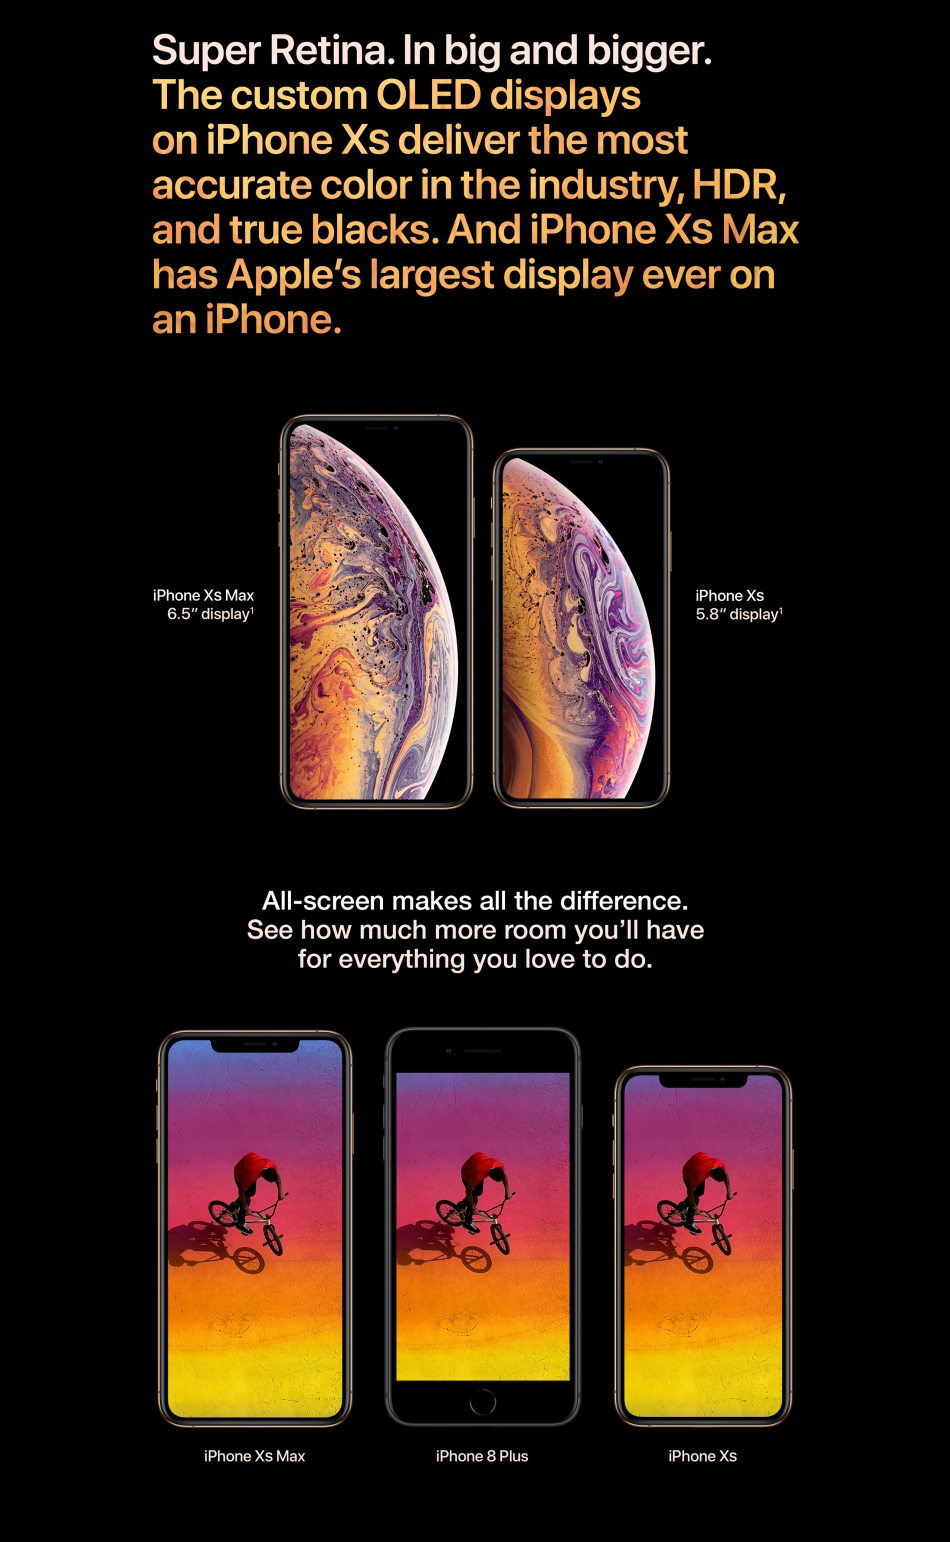 iPhone Xx Max ansd Xs